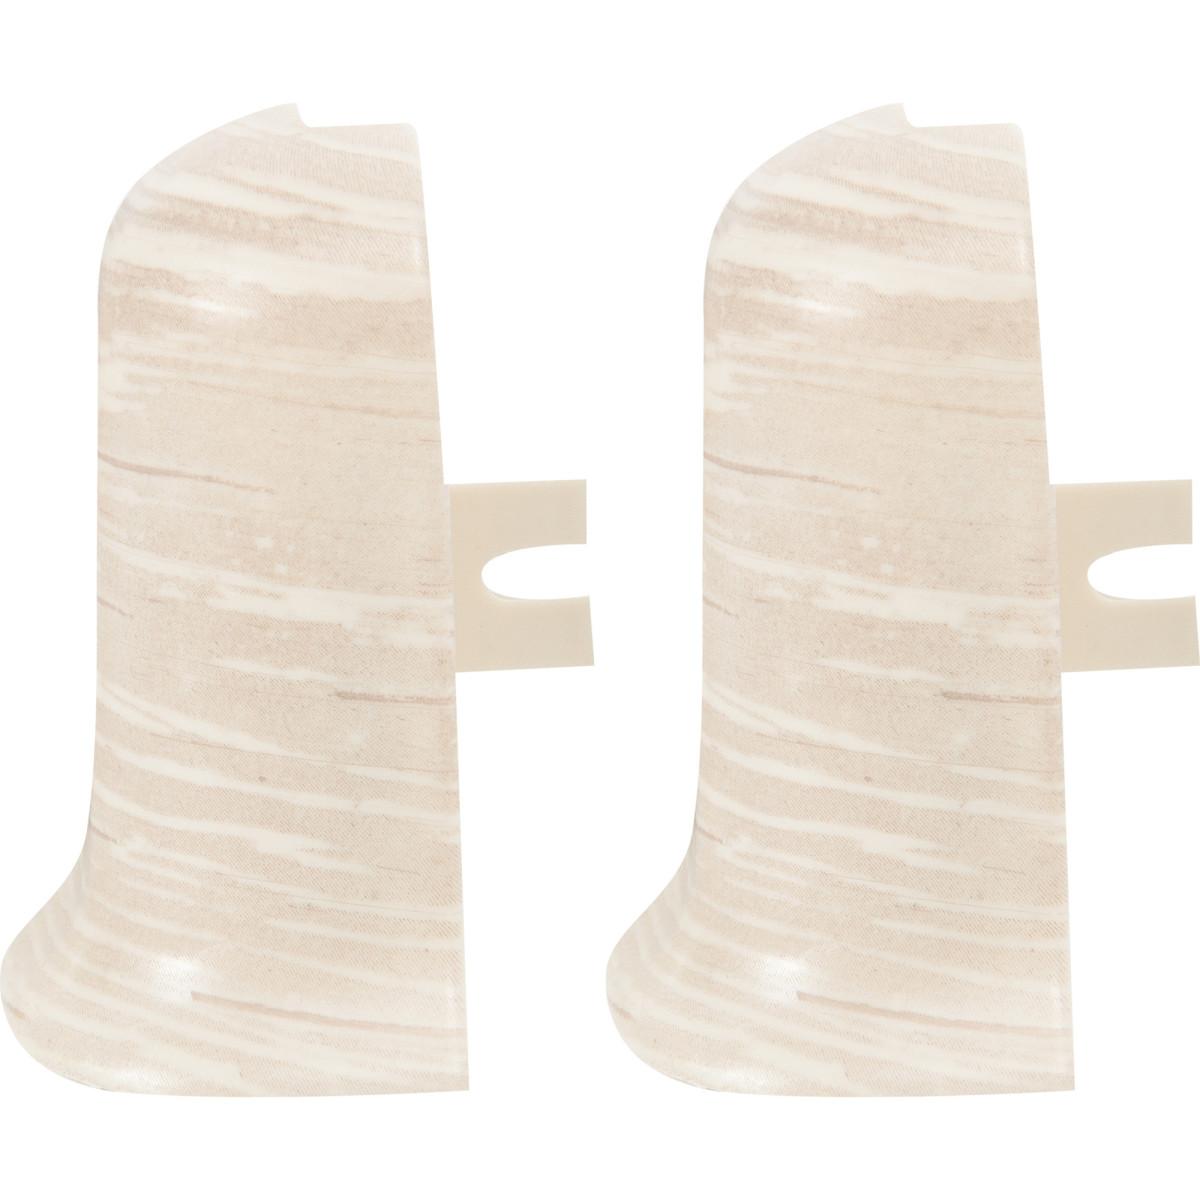 Угол для плинтуса внешний Дуб Алмере высота 56 мм 2 шт